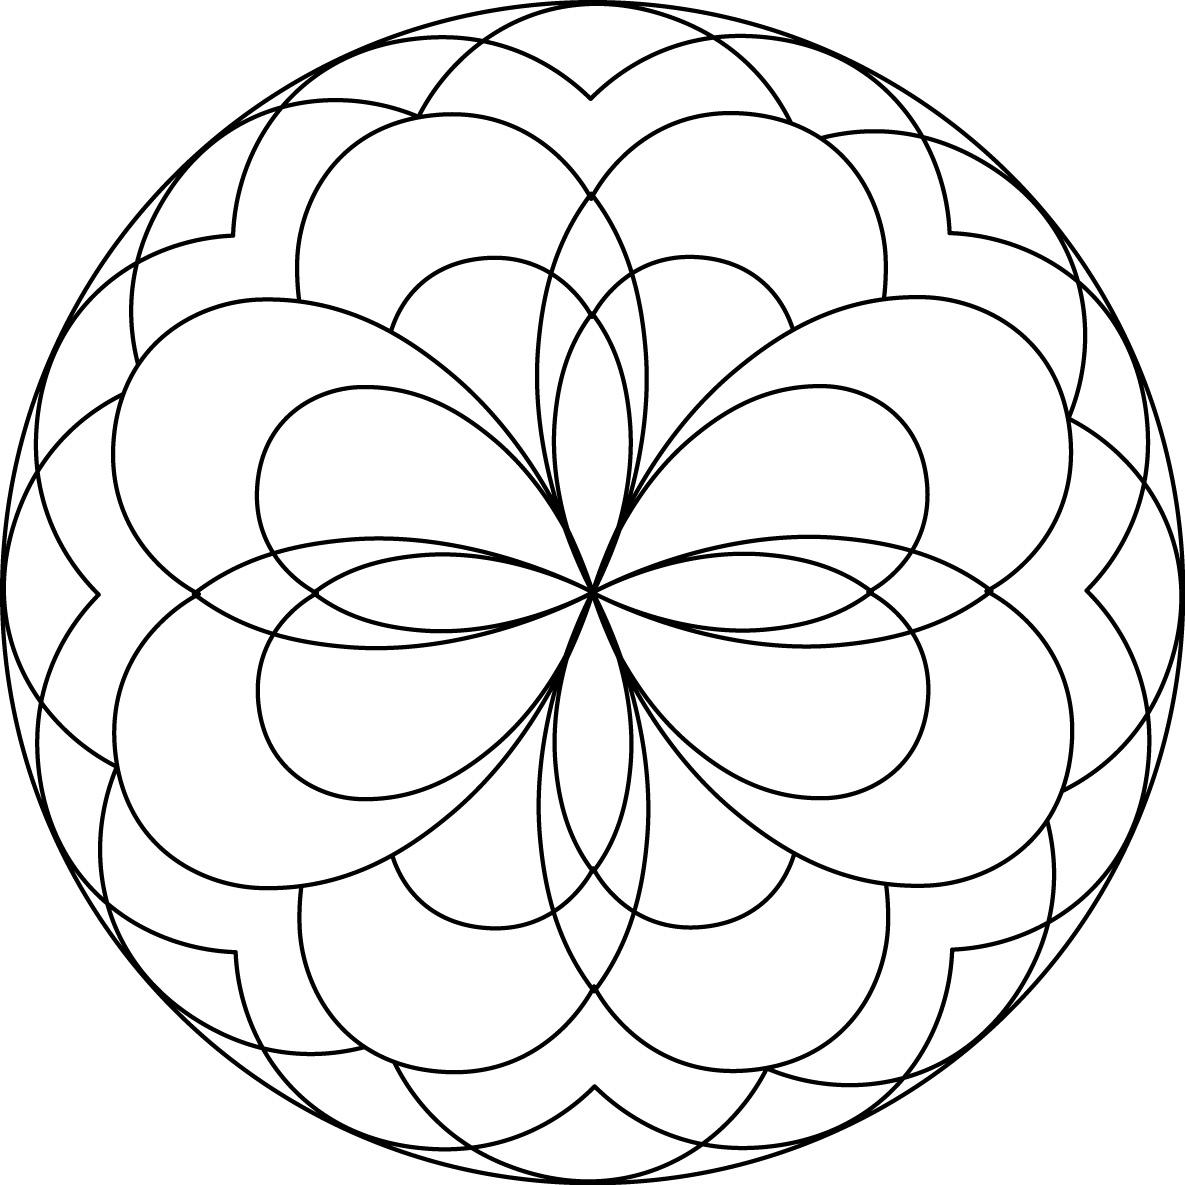 Simple Mandala Drawing At Getdrawings Com Free For Personal Use